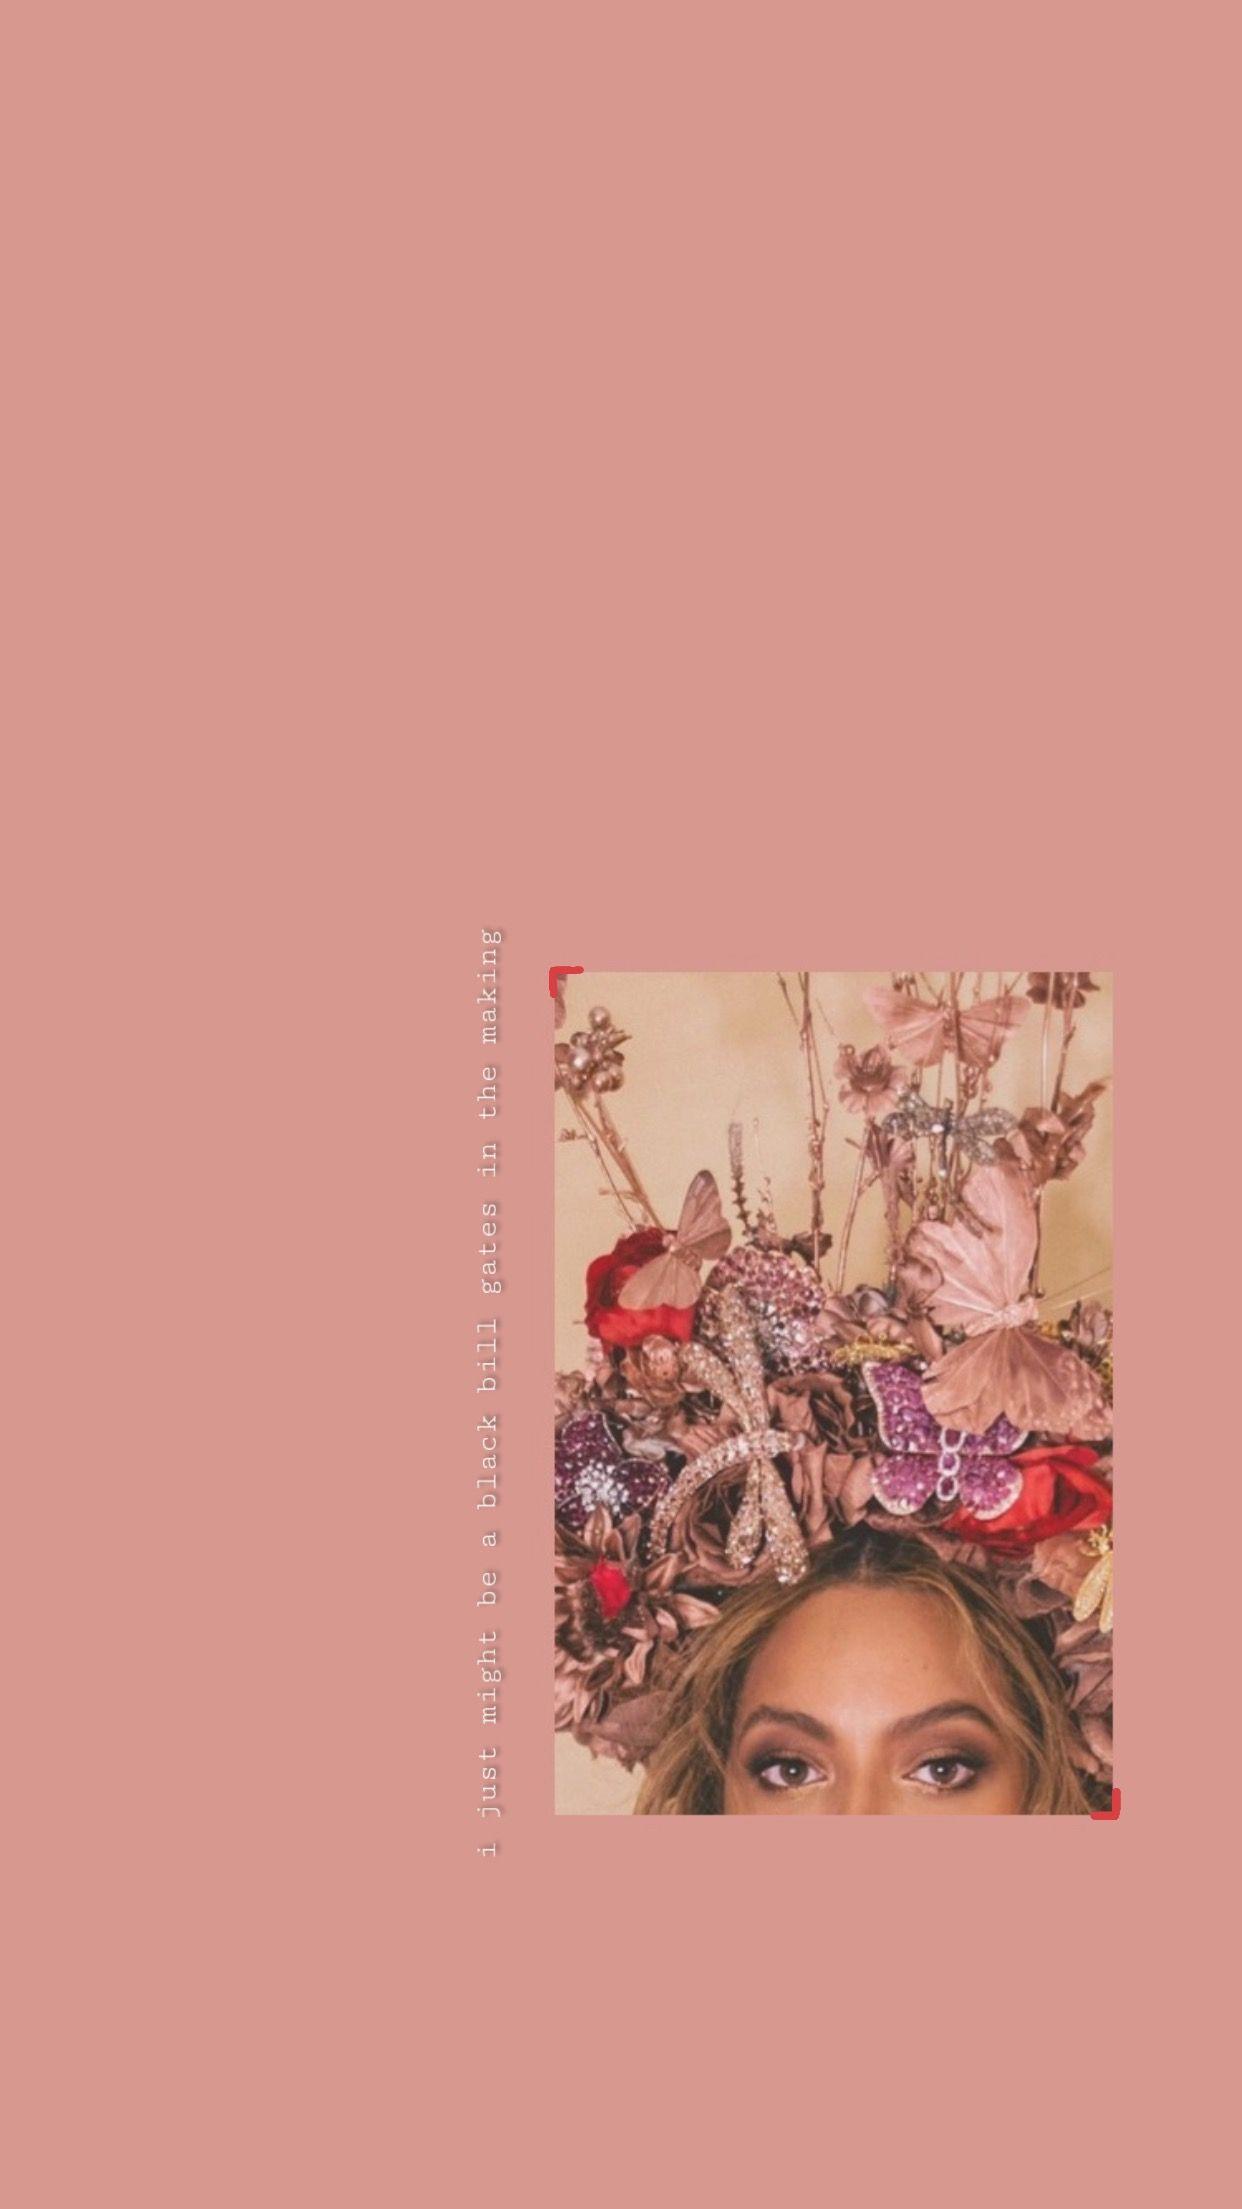 Beyonce Wallpaper Beyonce Photoshoot Beyonce Background Beyonce Memes